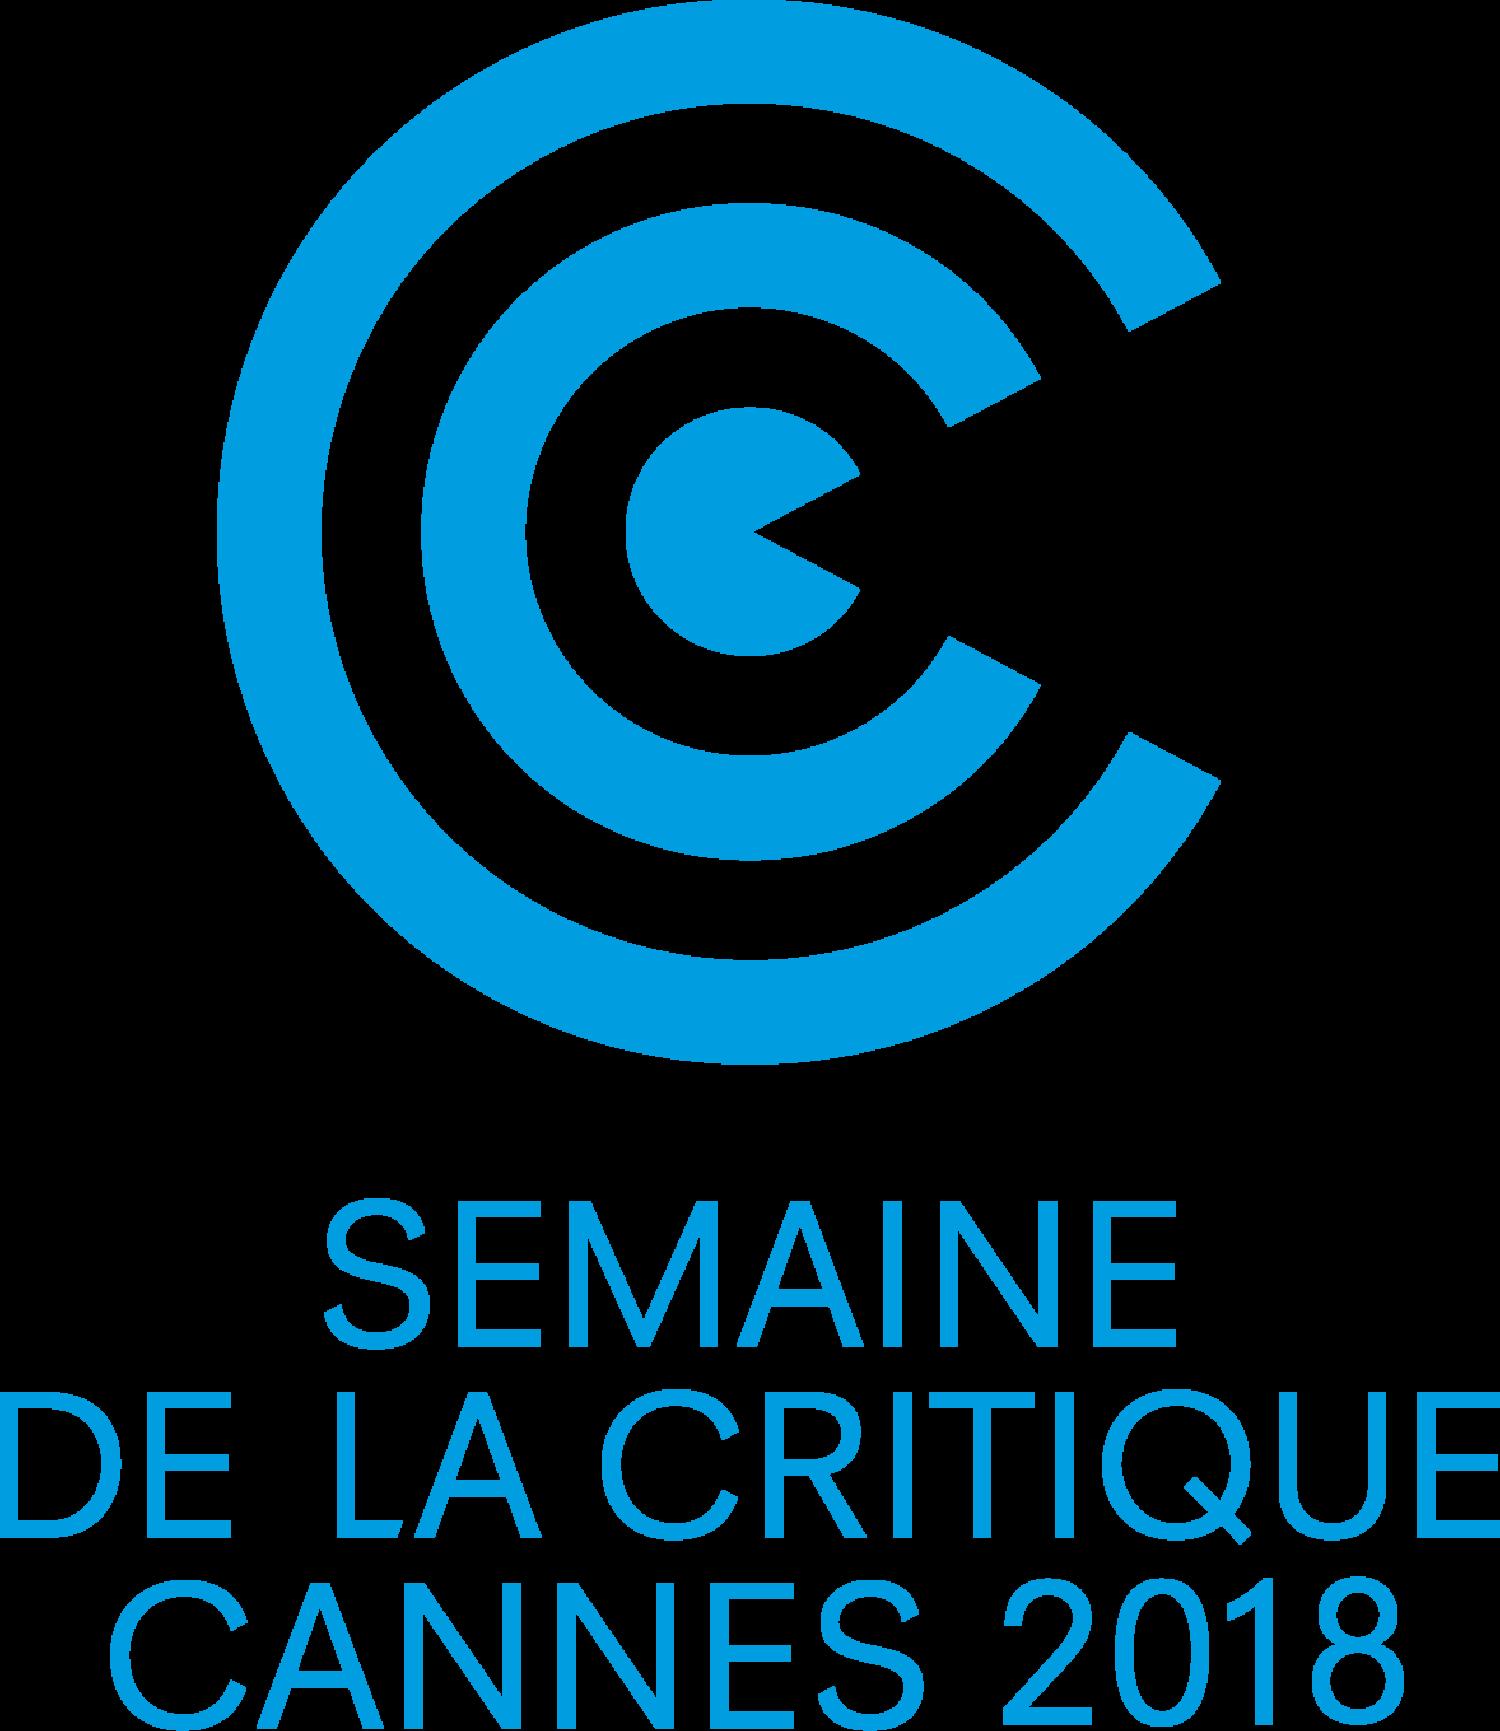 logo-selection-monochrome_blue